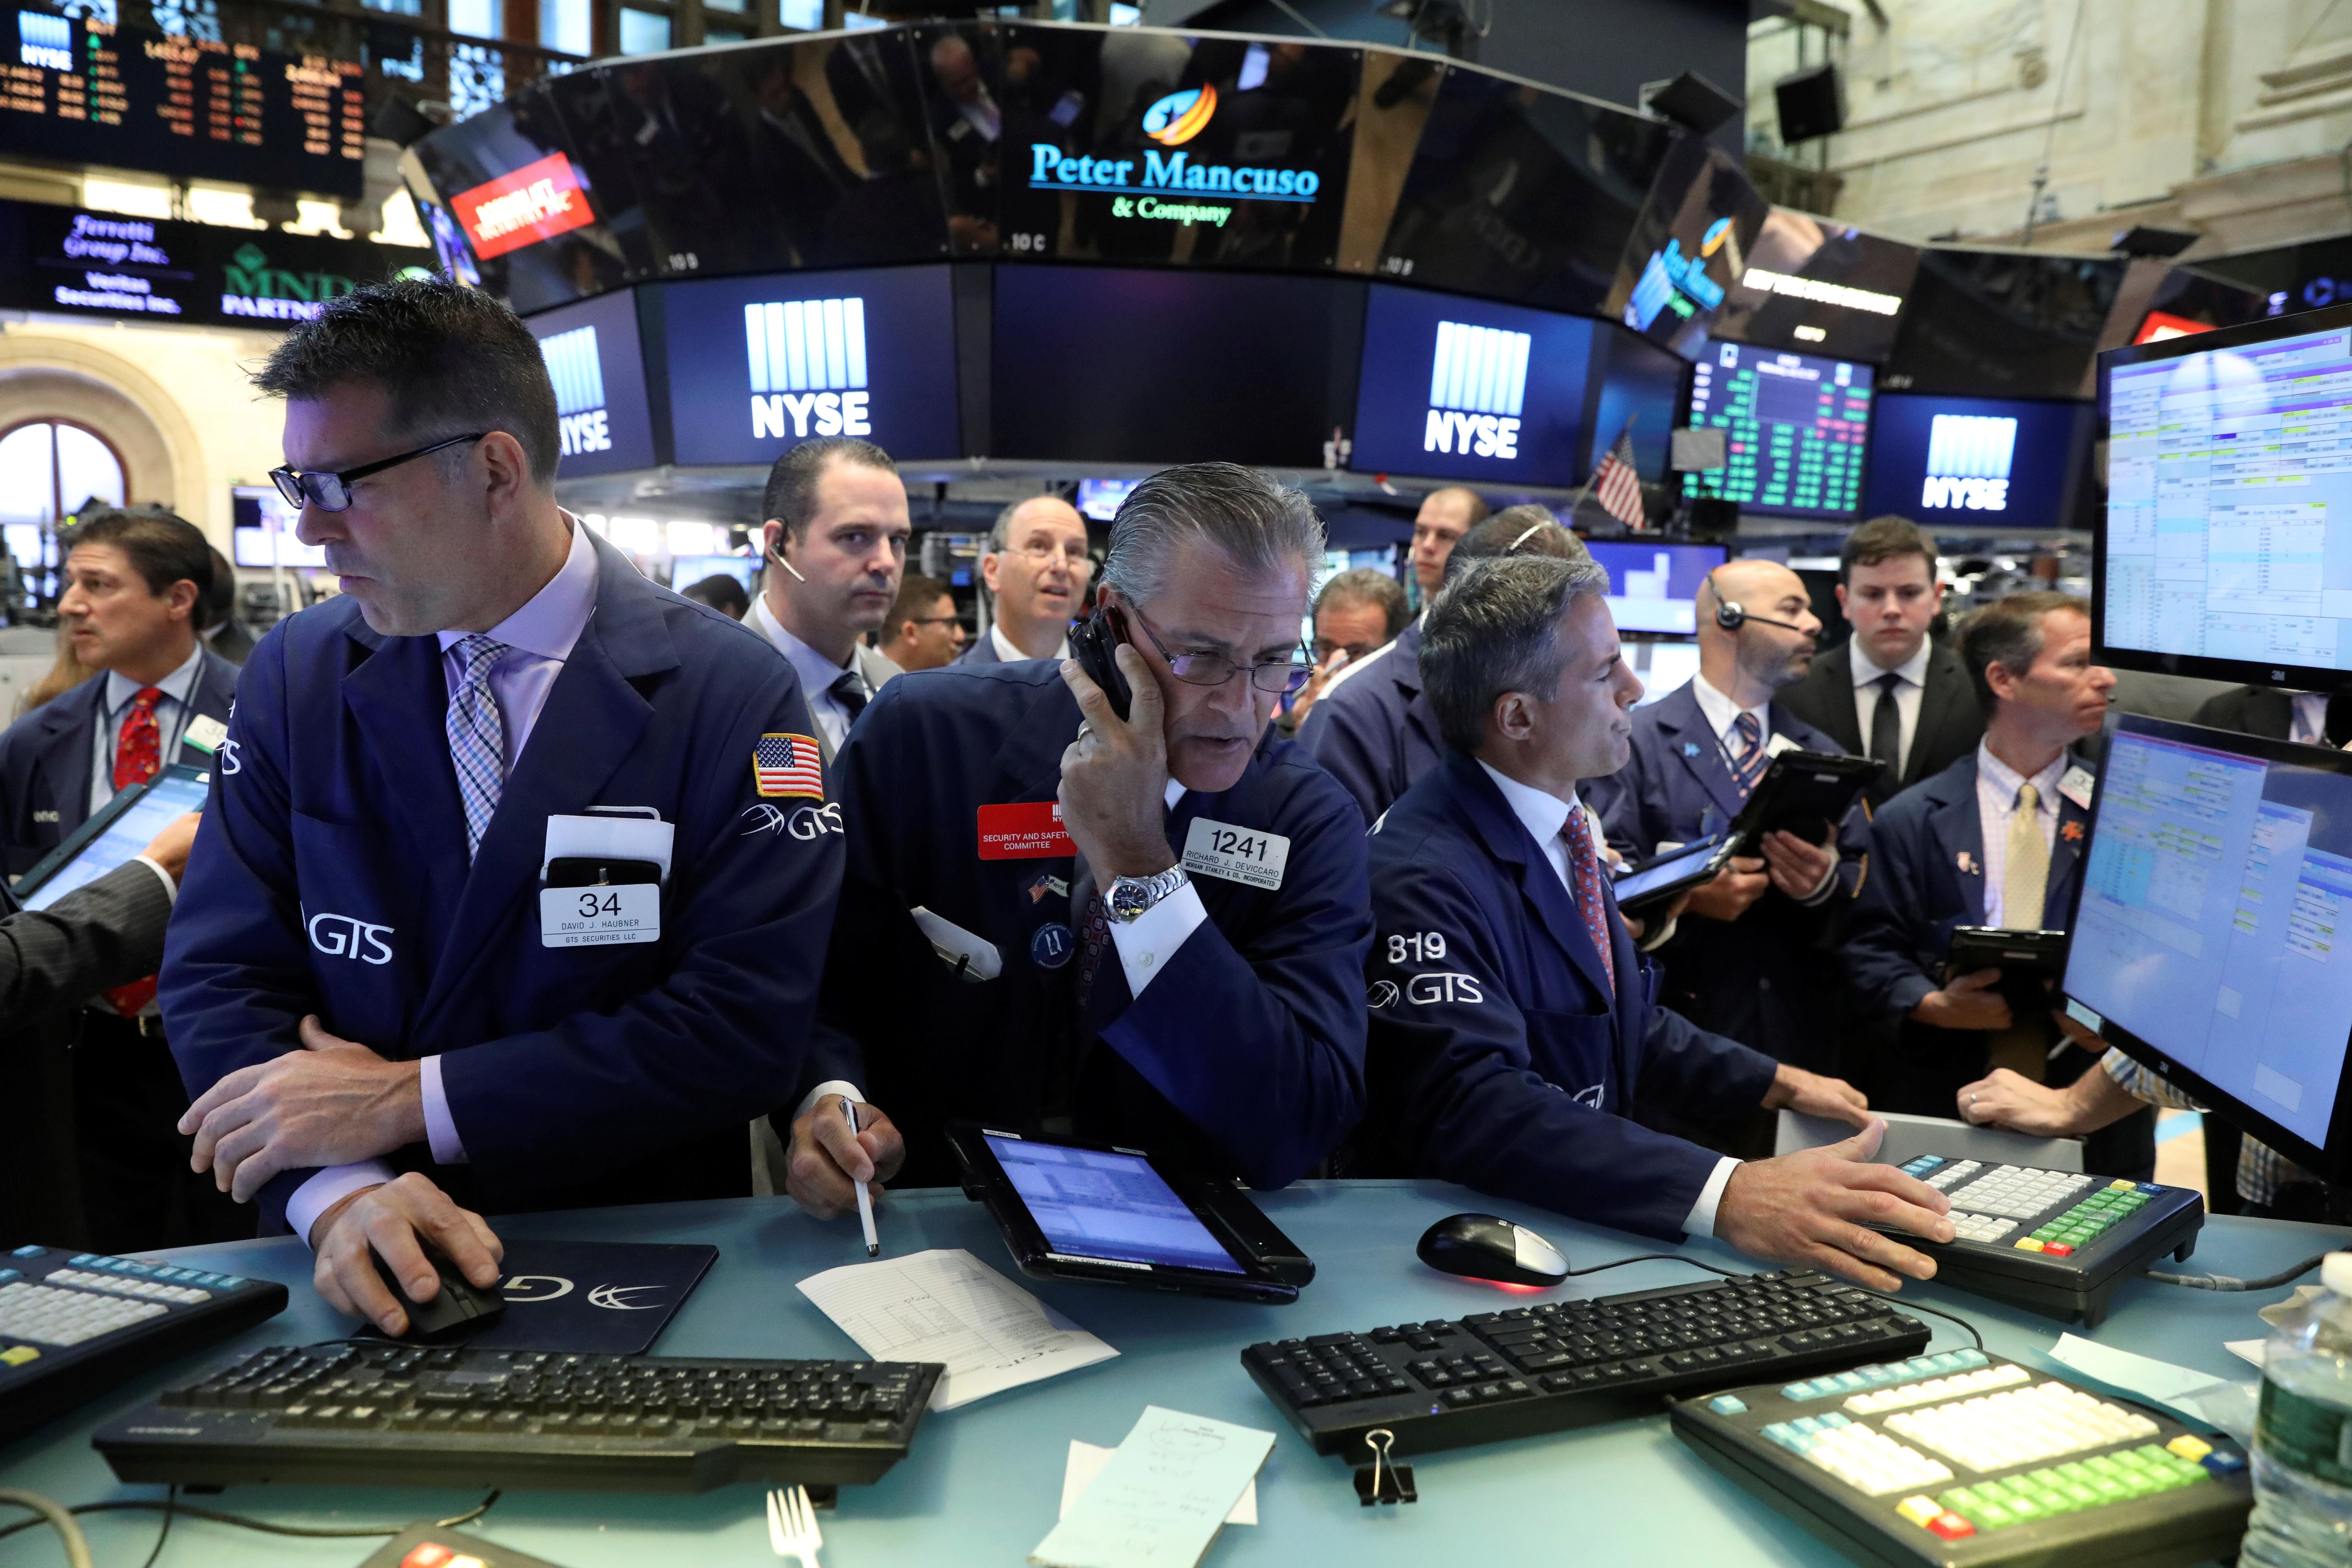 170719_NYSE traders